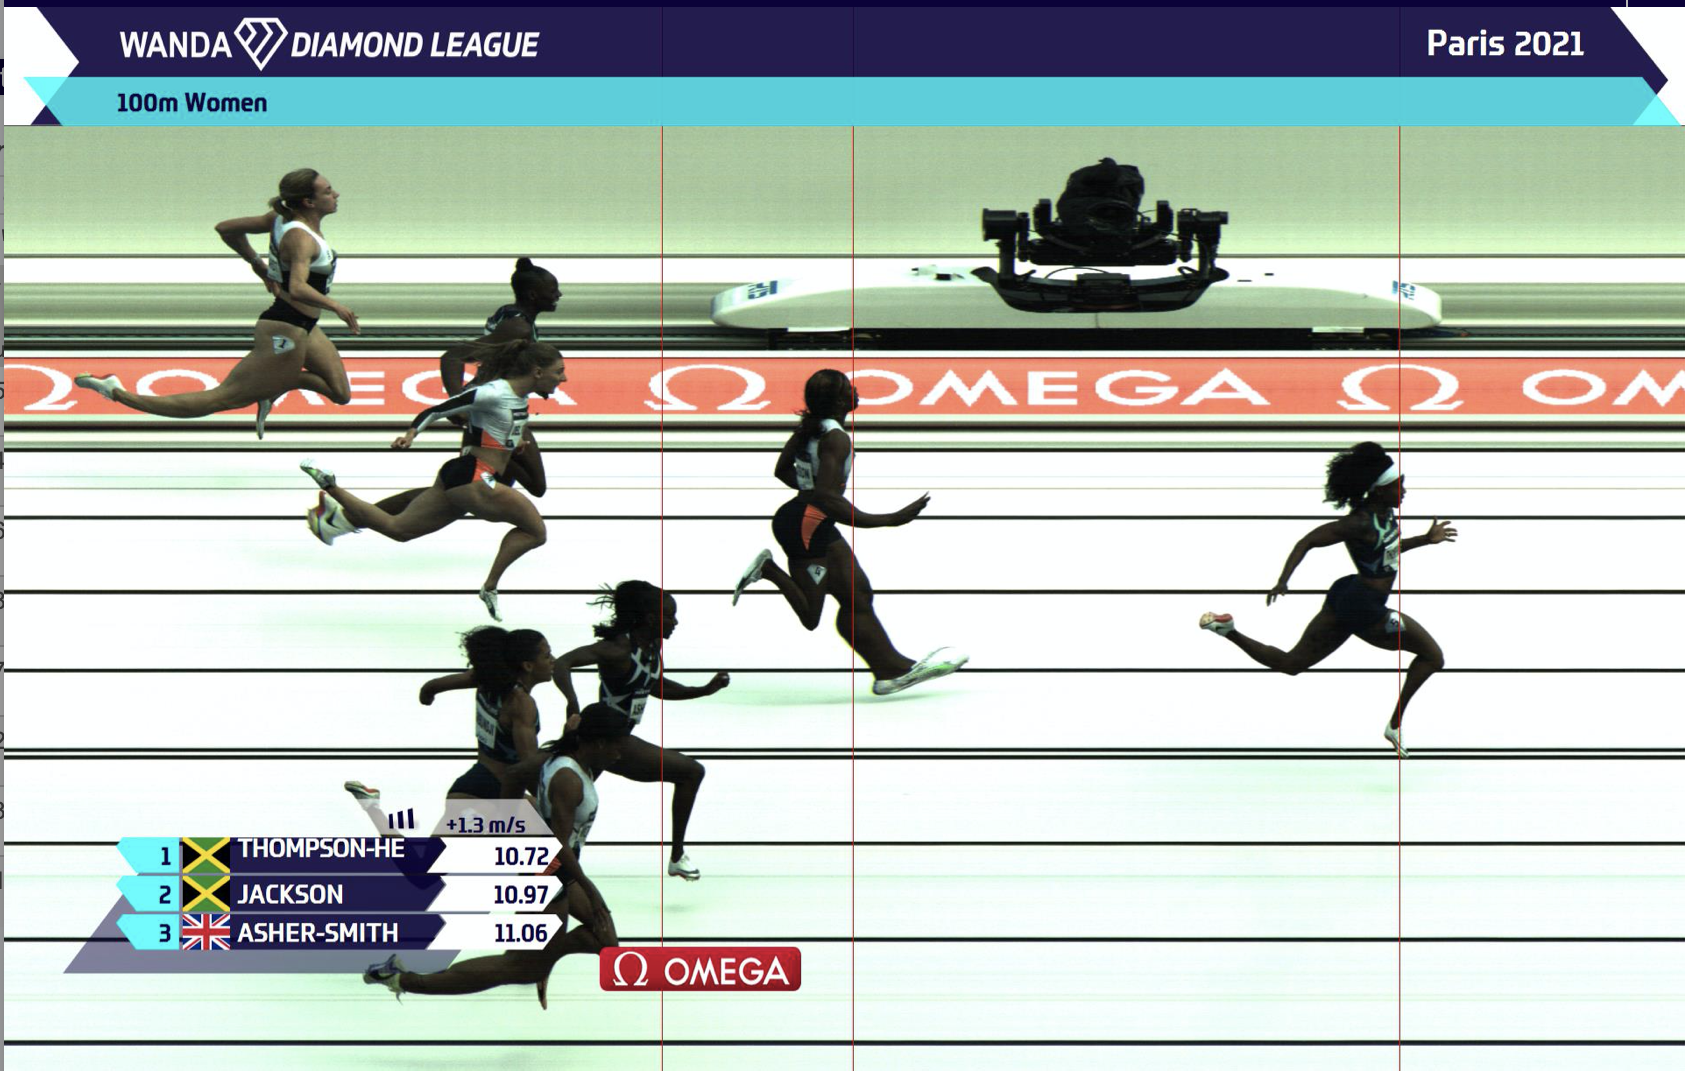 Foto finish de la prueba de los 100 metros femeninos.